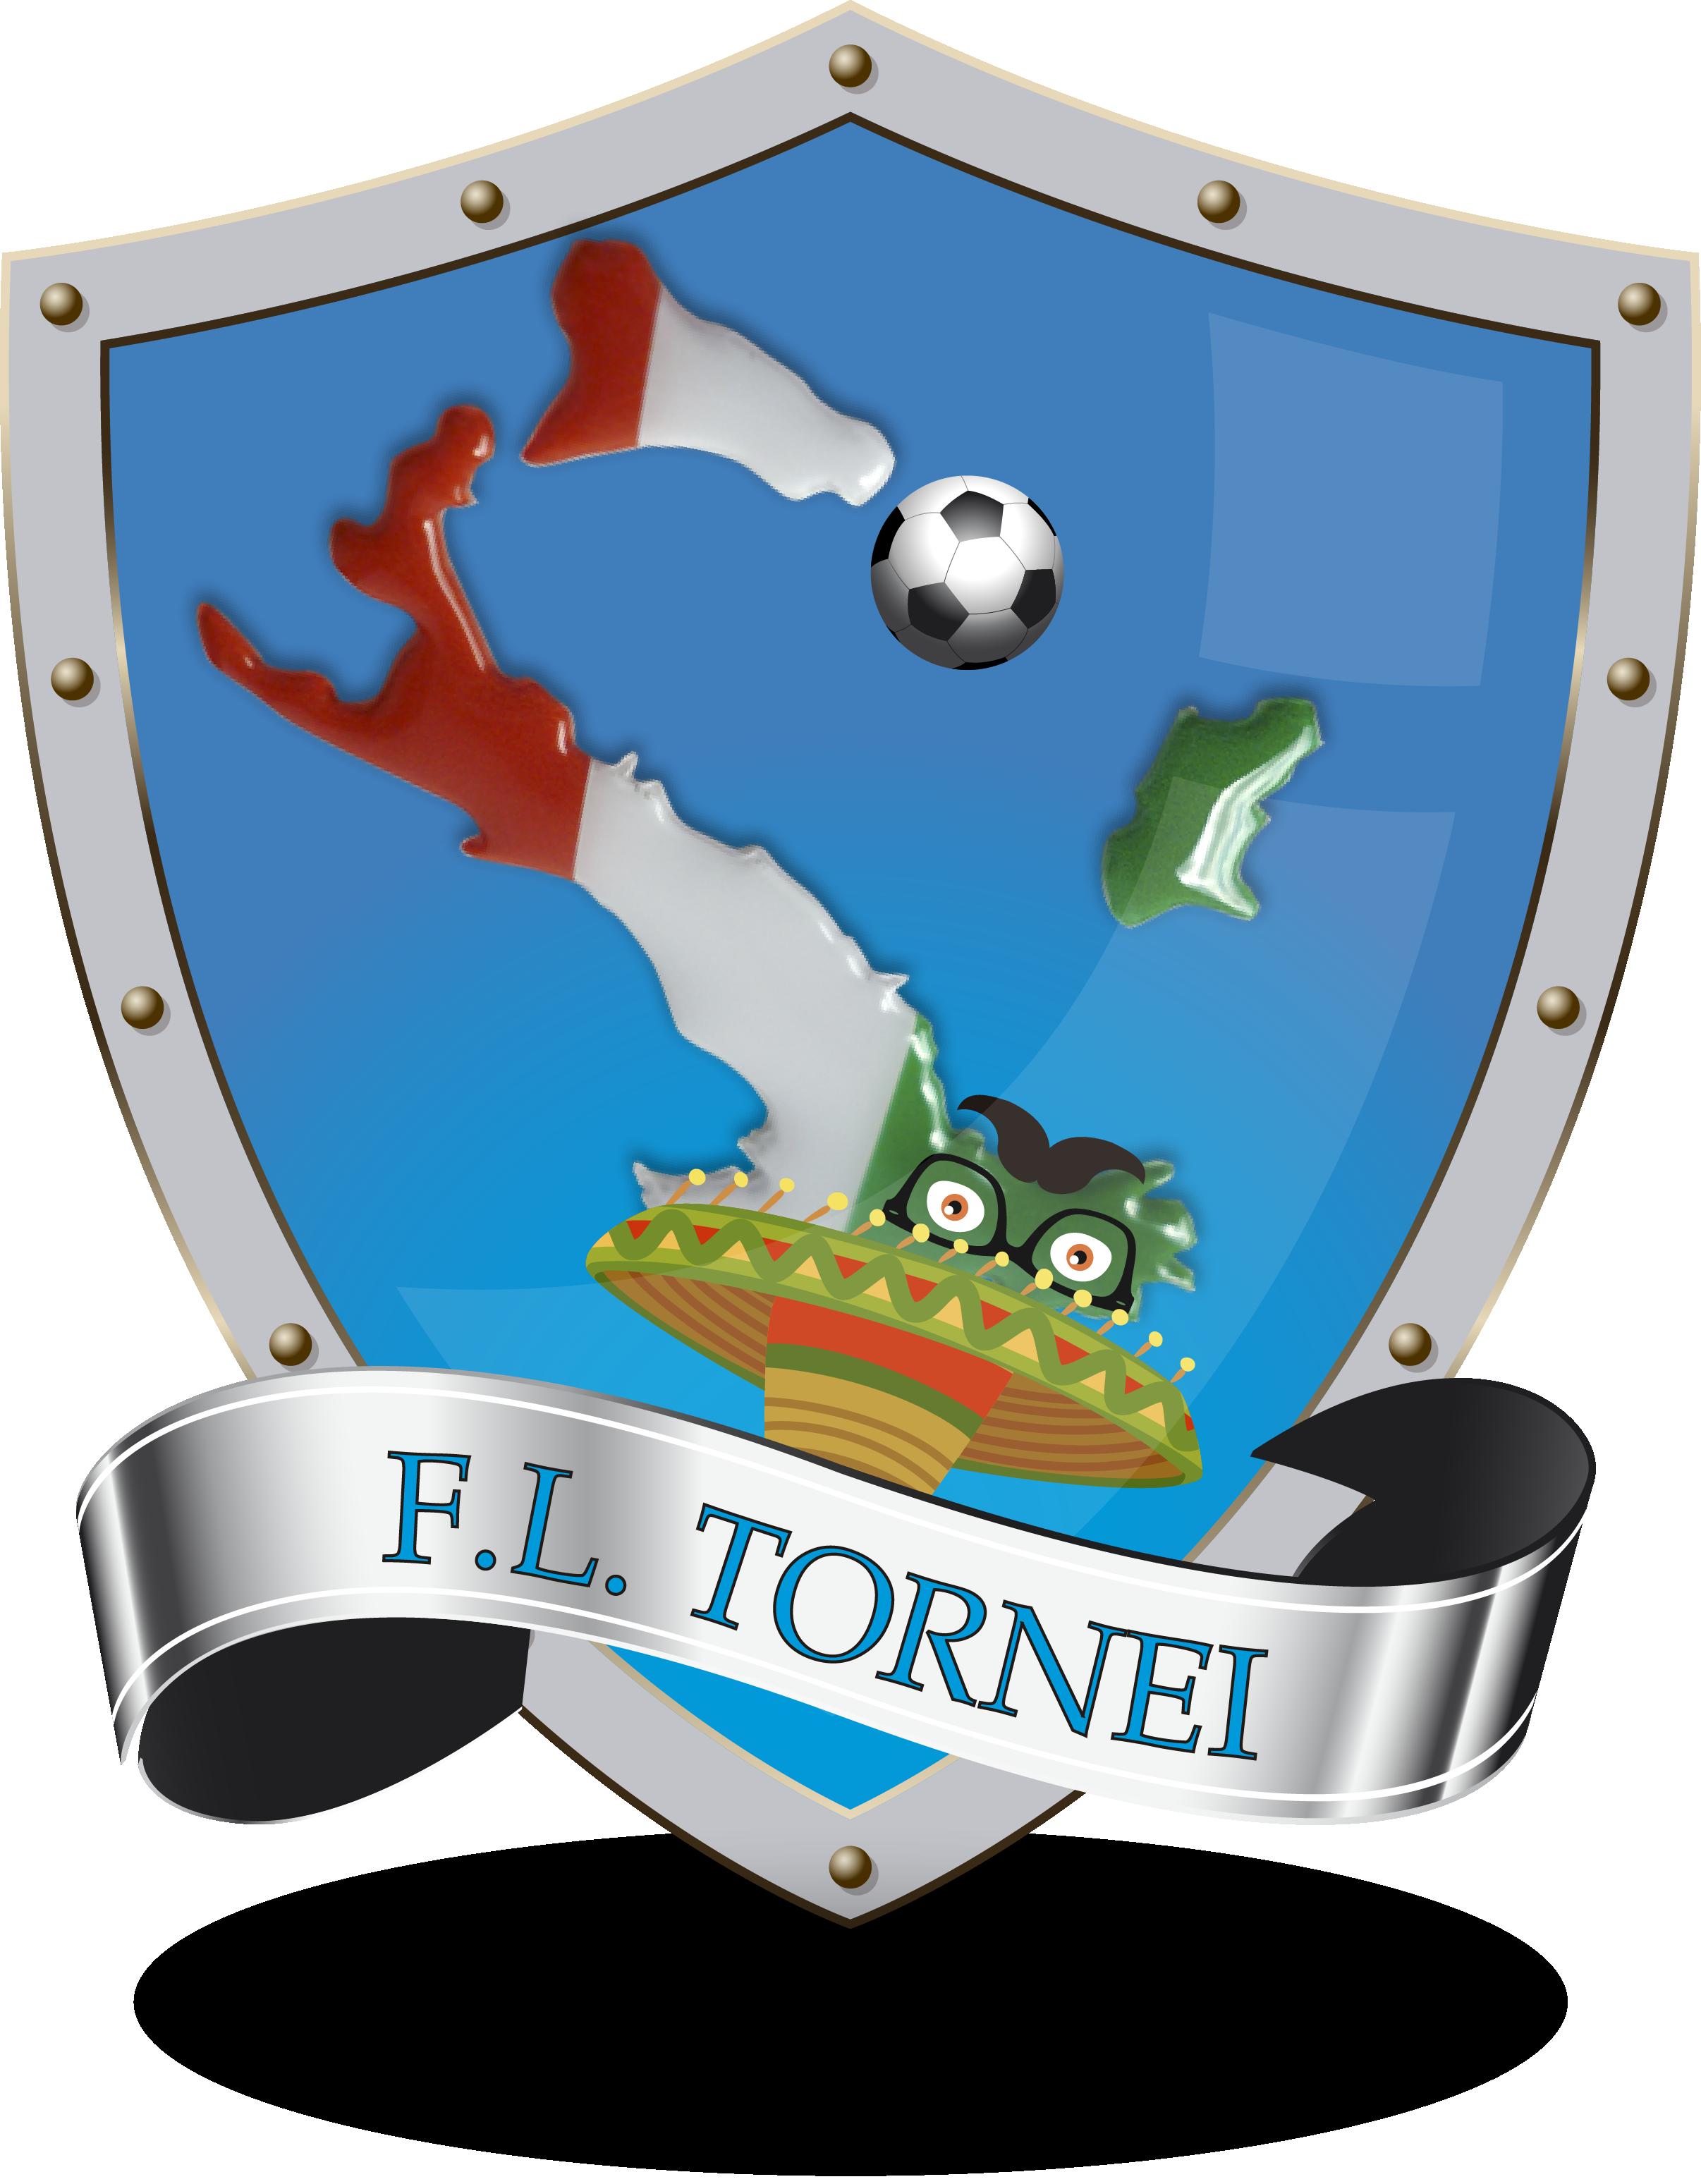 F.L. Tornei